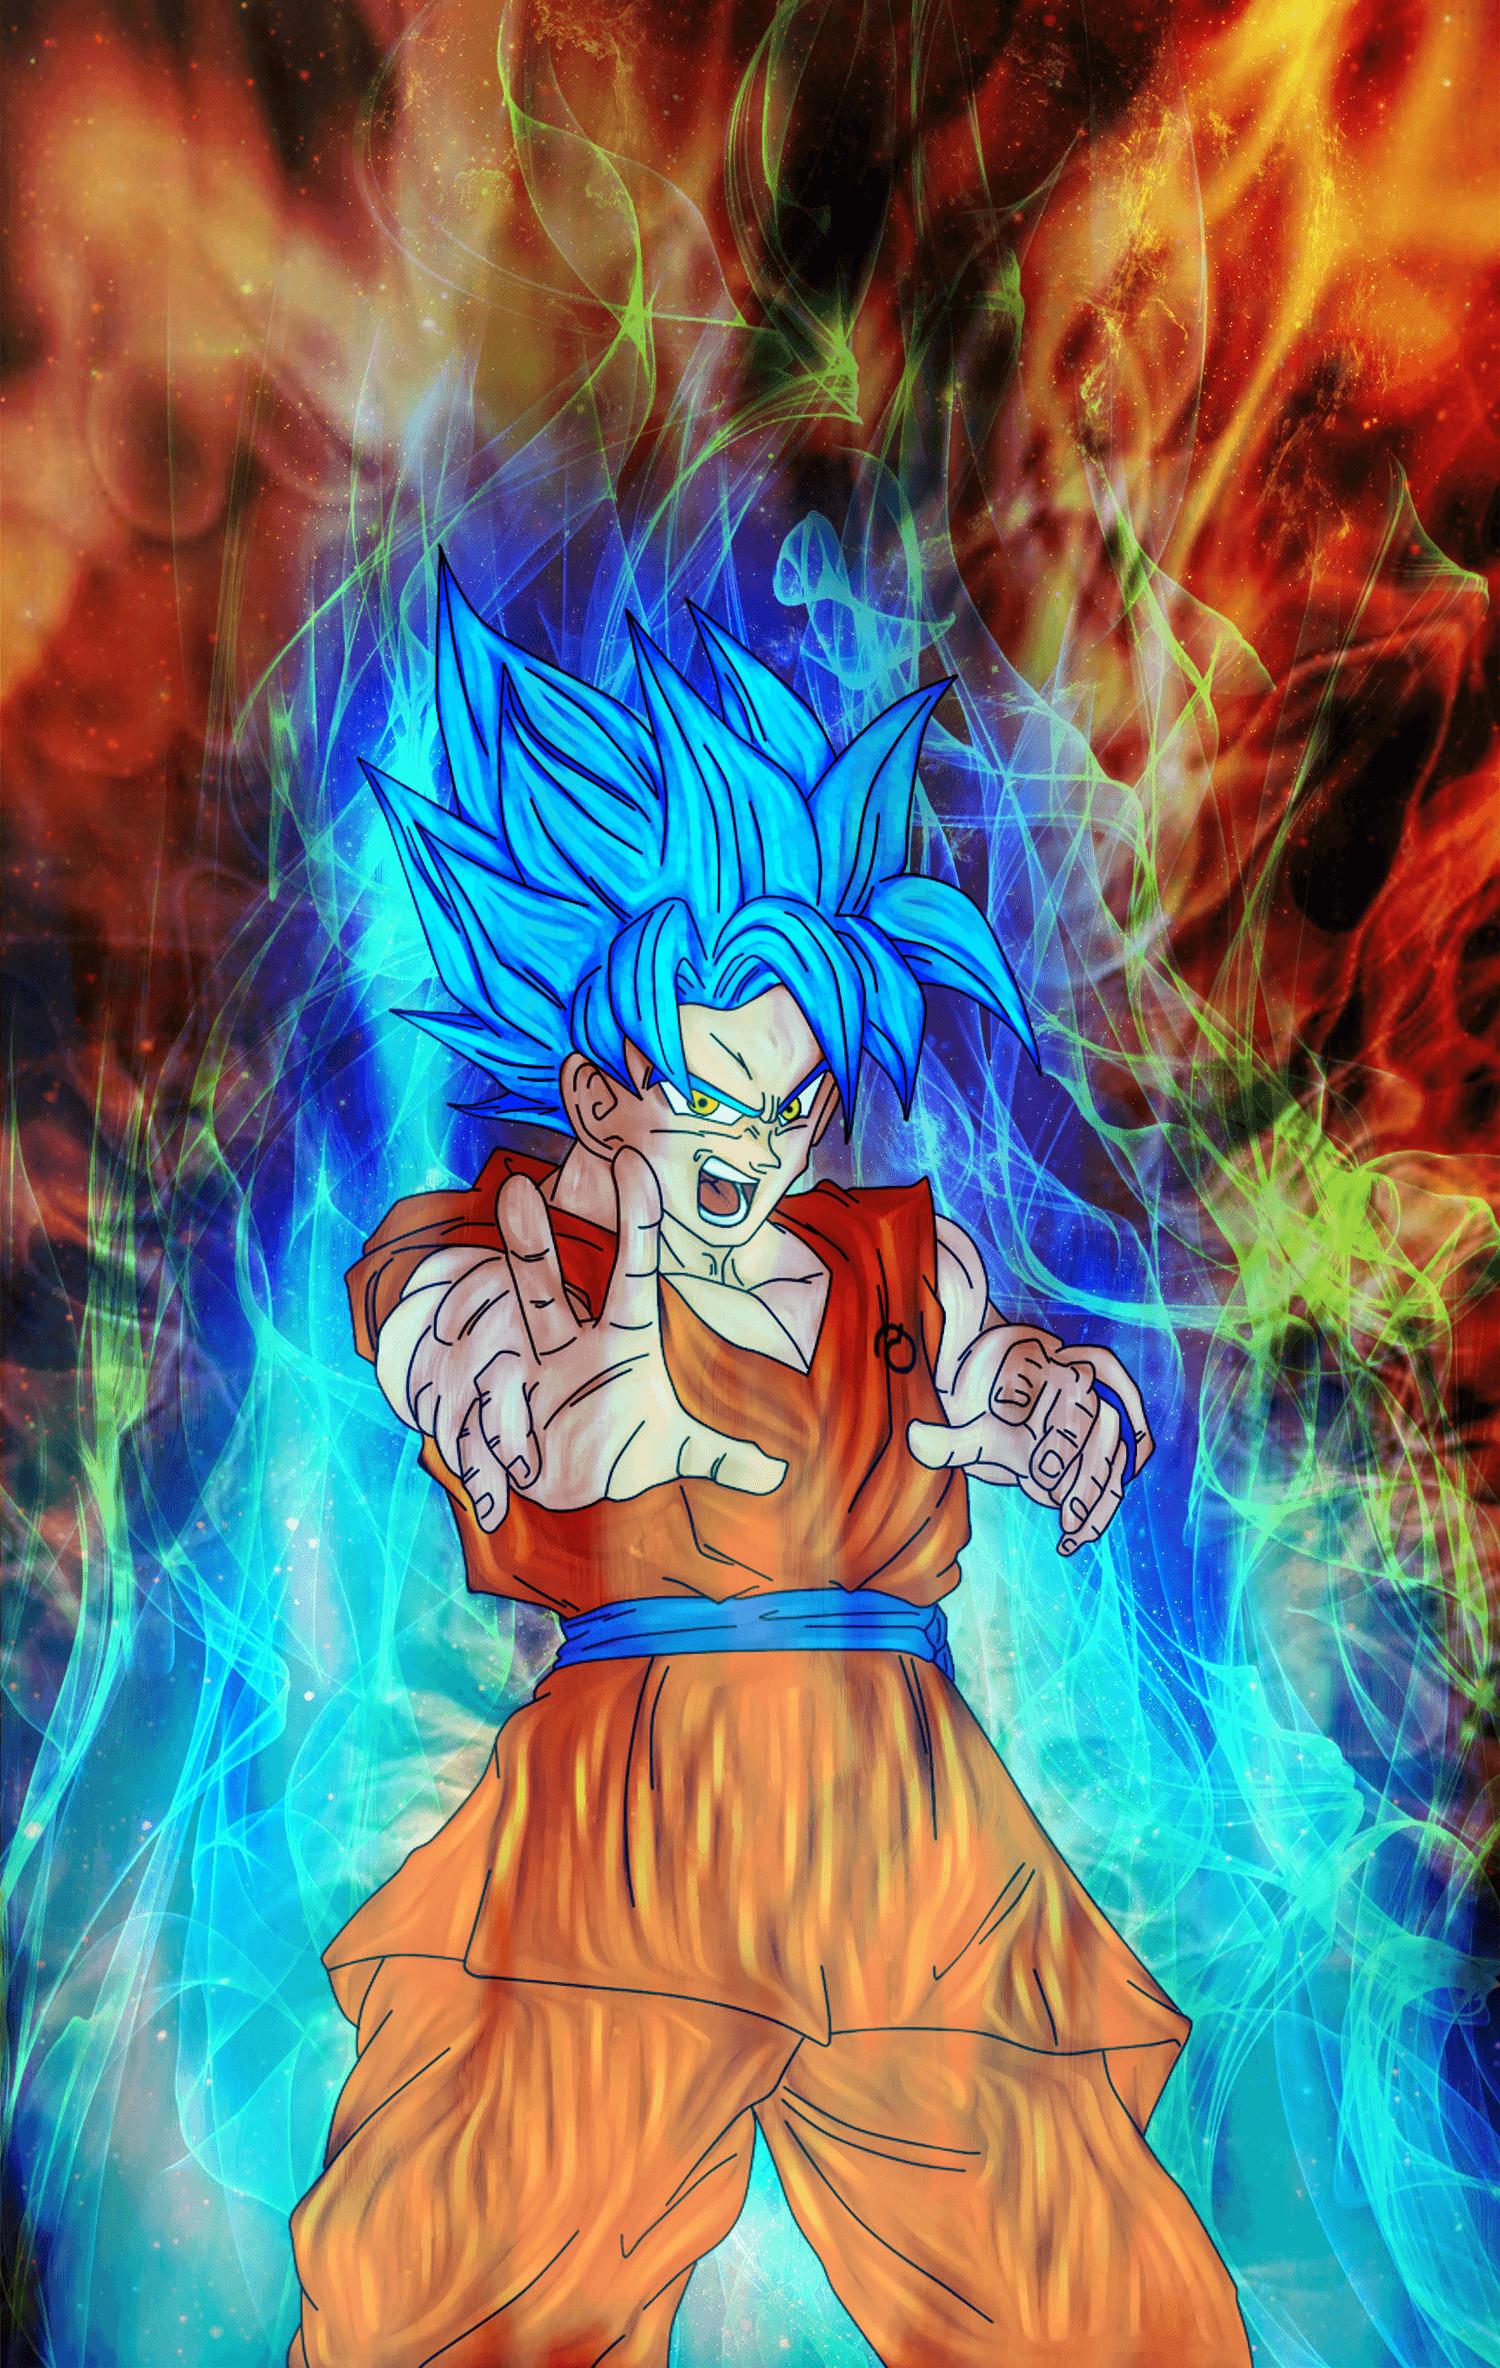 Goku Super Saiyan 3 Blue And Gold Wallpapers Wallpaper Cave